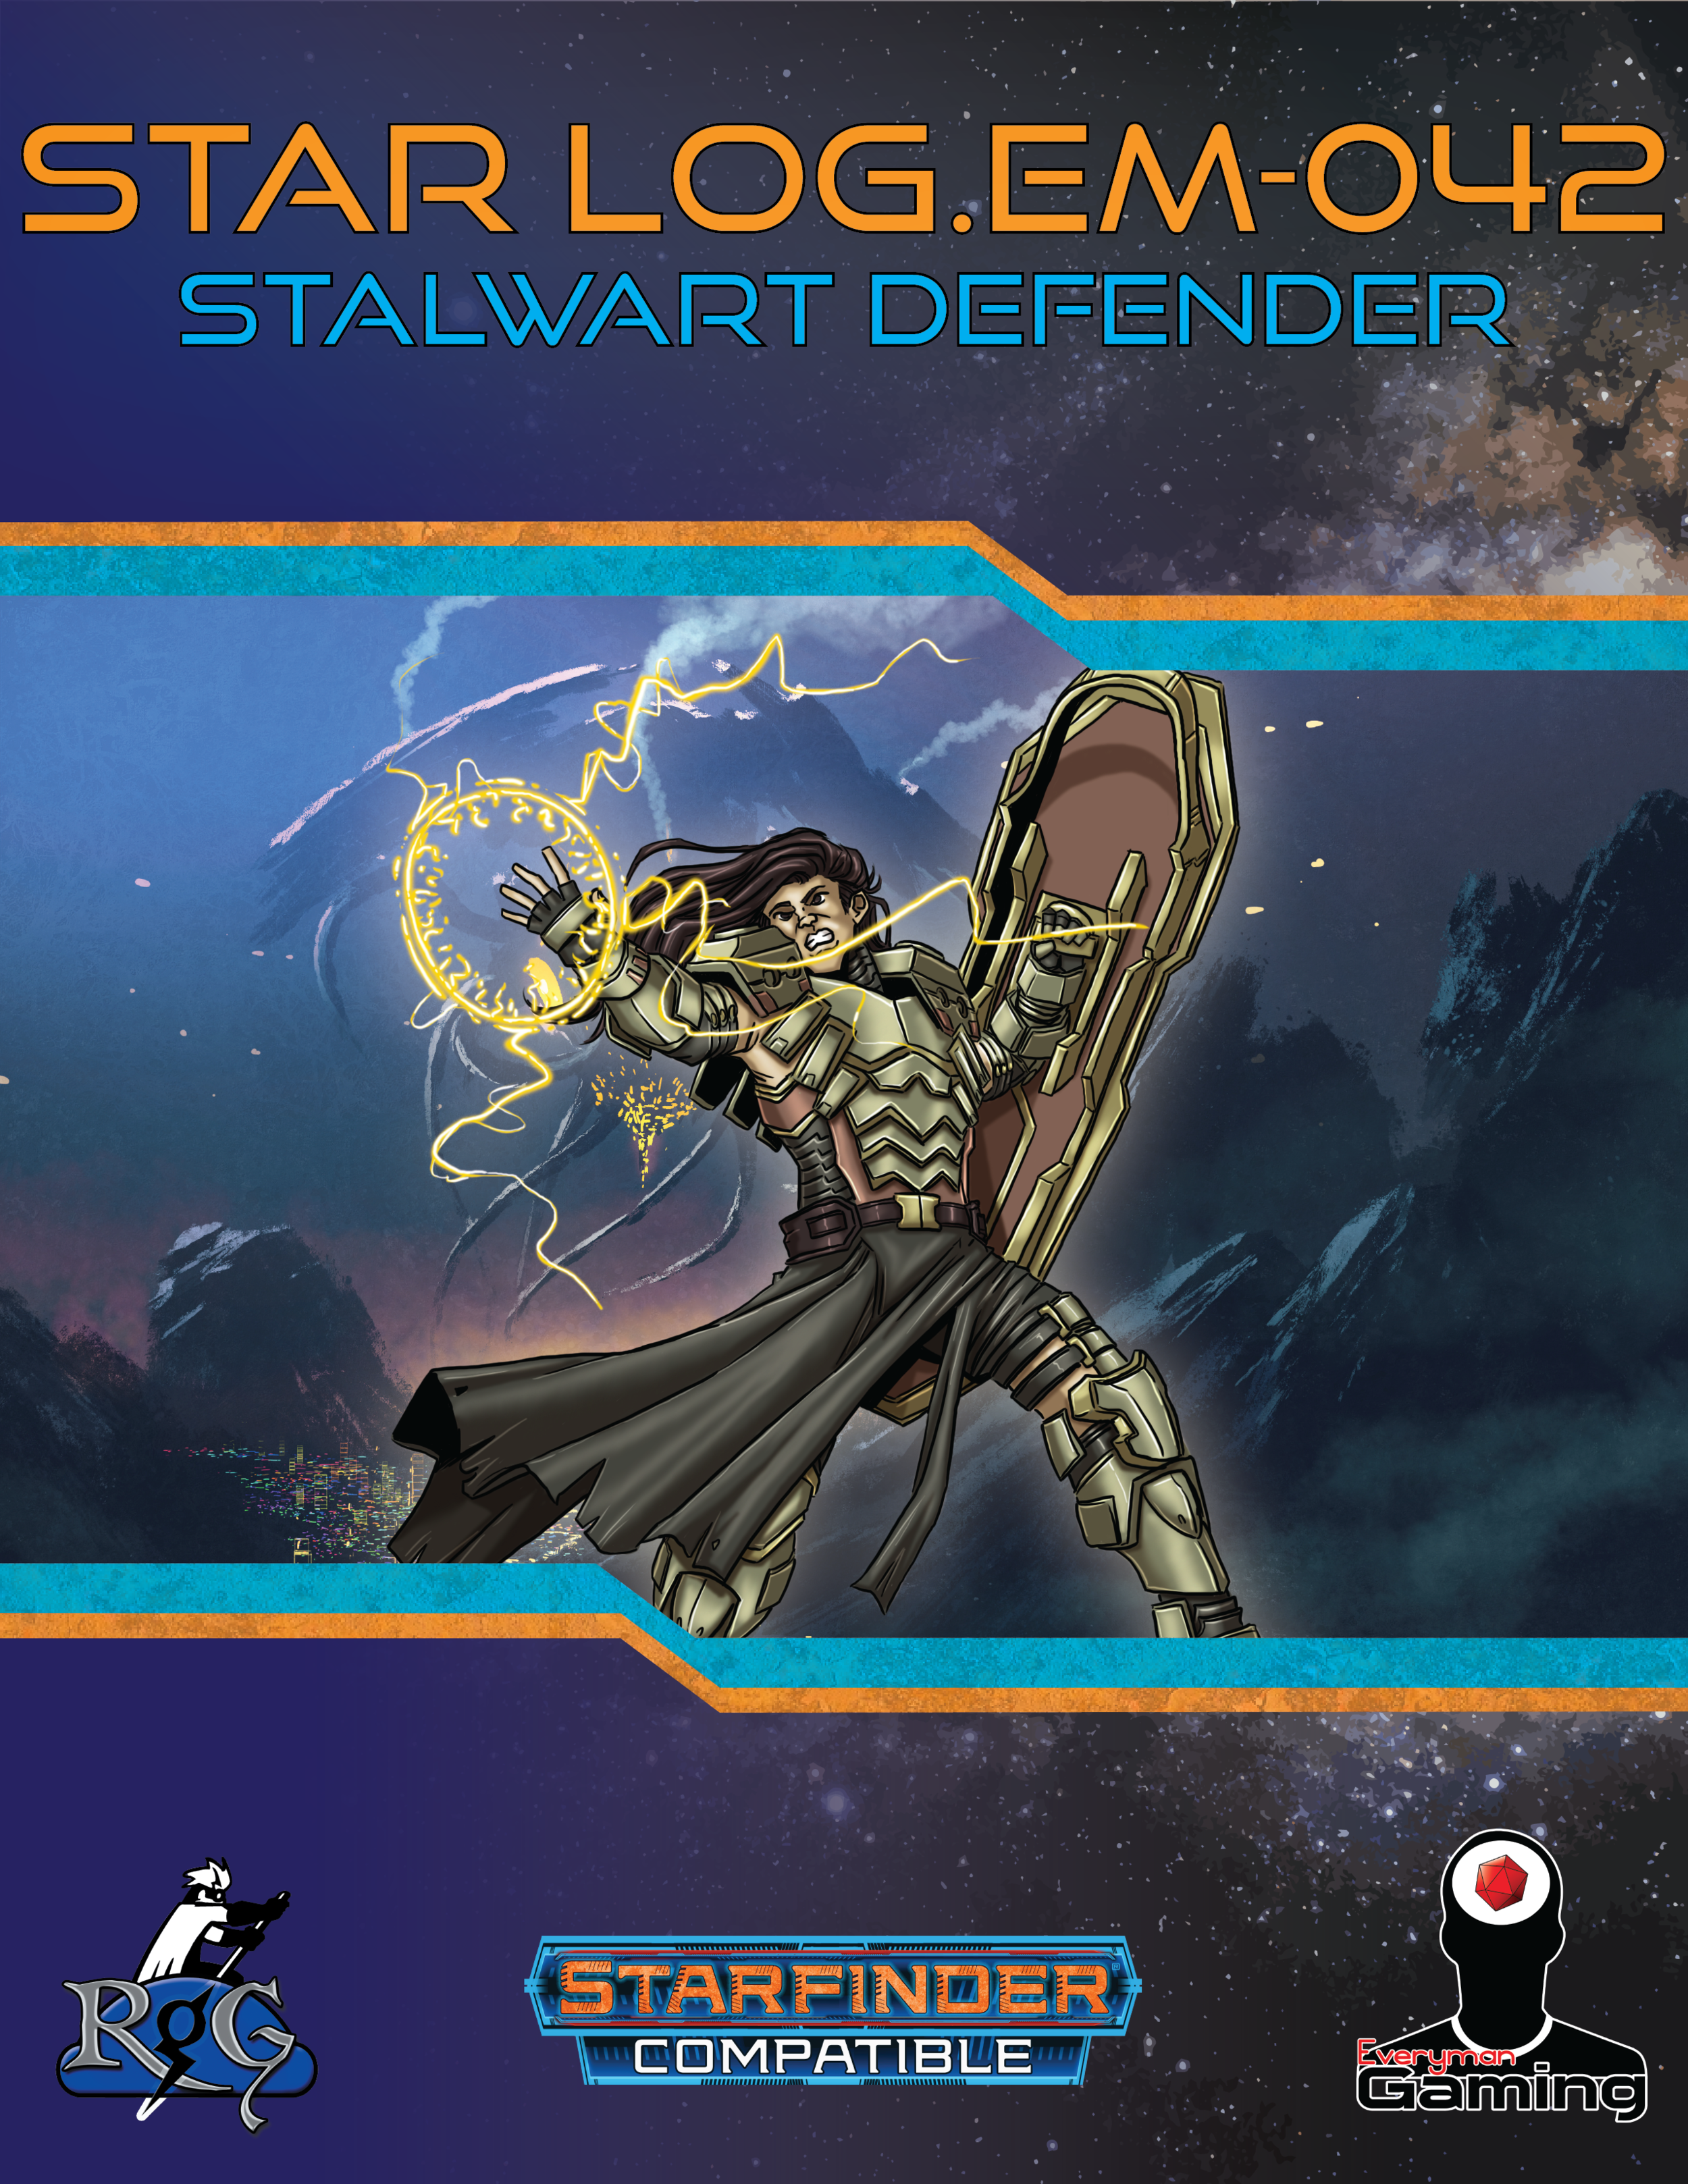 SF042 Stalwart Defender.png